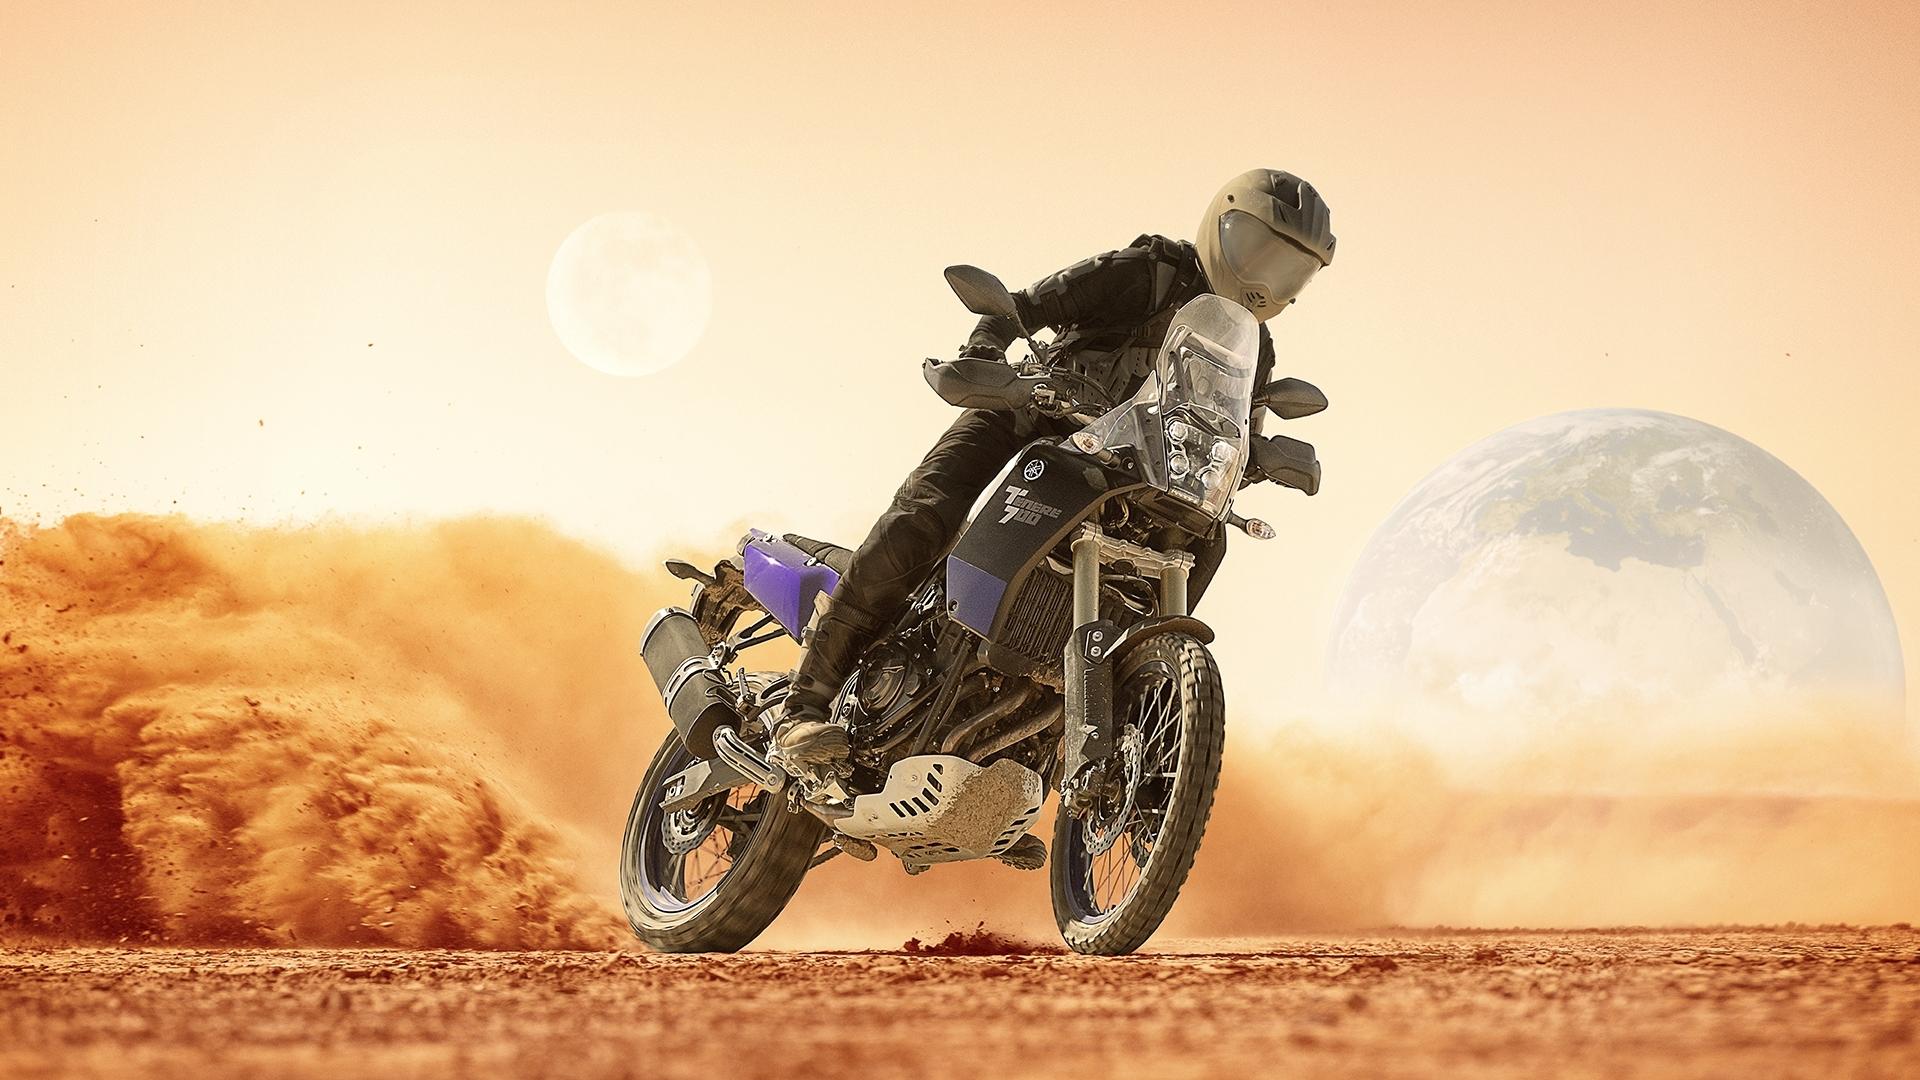 2019-Yamaha-XTZ700-EU-Power_Black-Keyvisual-001-04.jpg